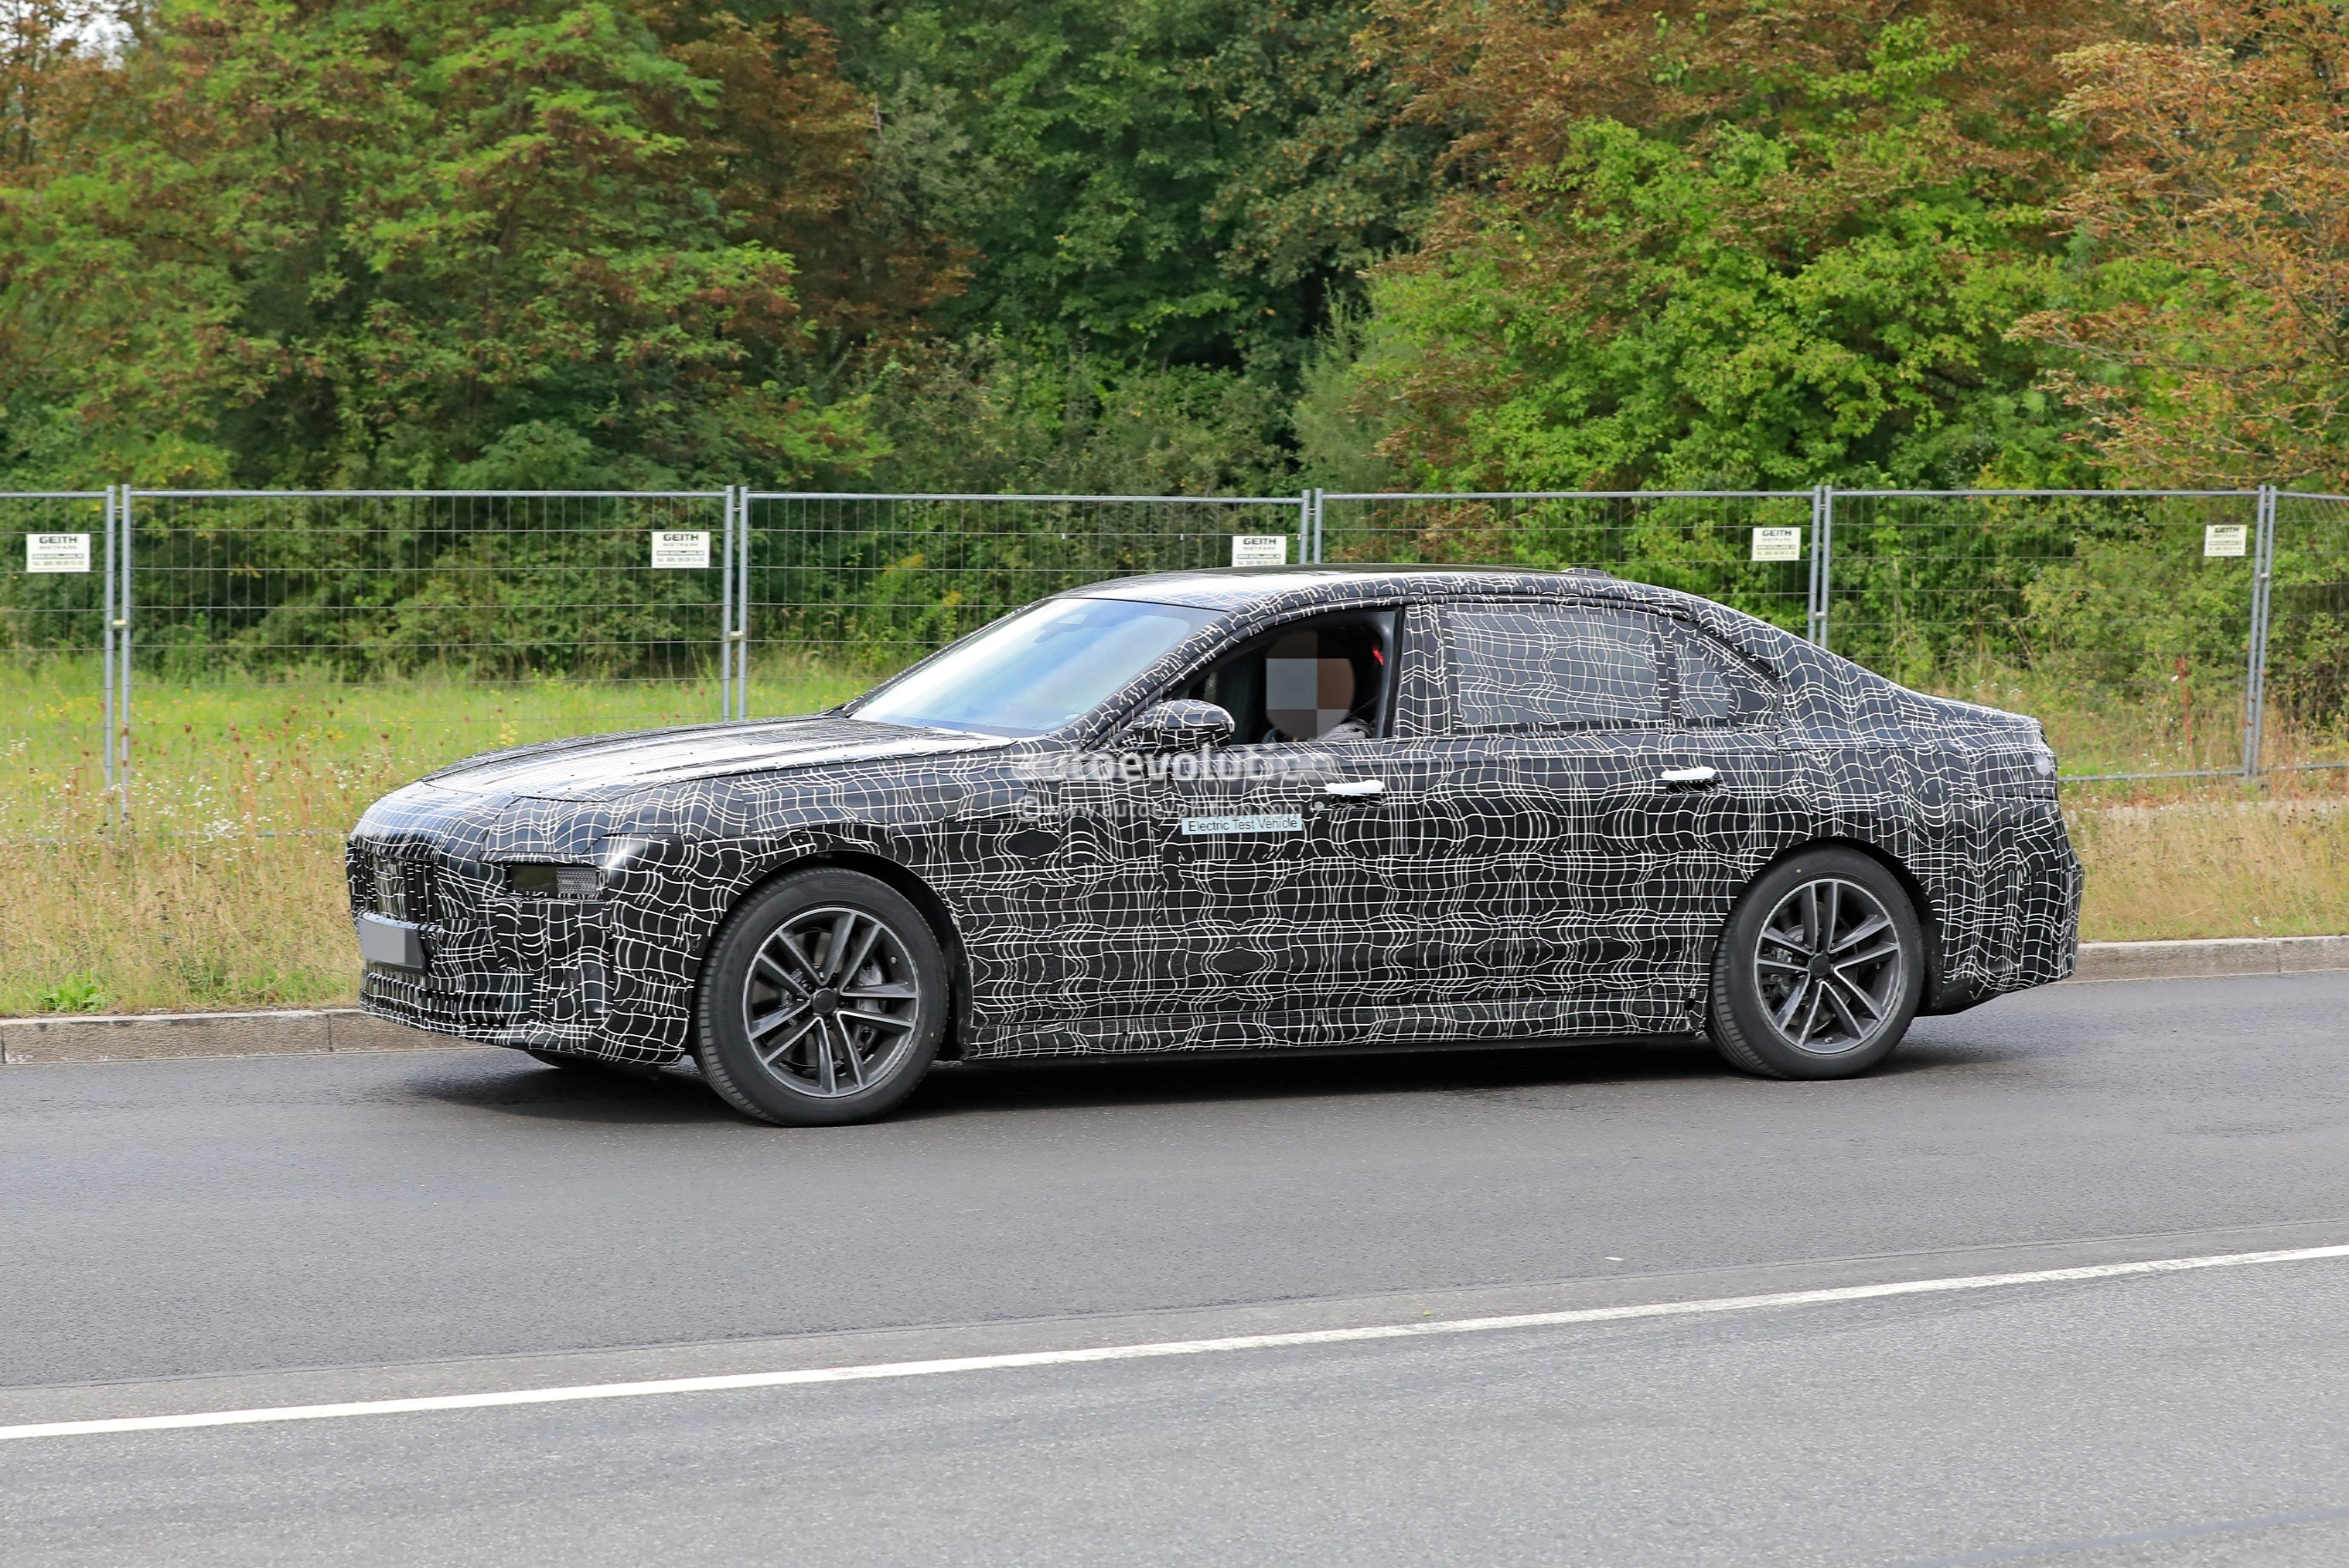 Electric Bmw 7 Series Spied Road Testing 2023 Bmw I7 Looks Massive Autoevolution